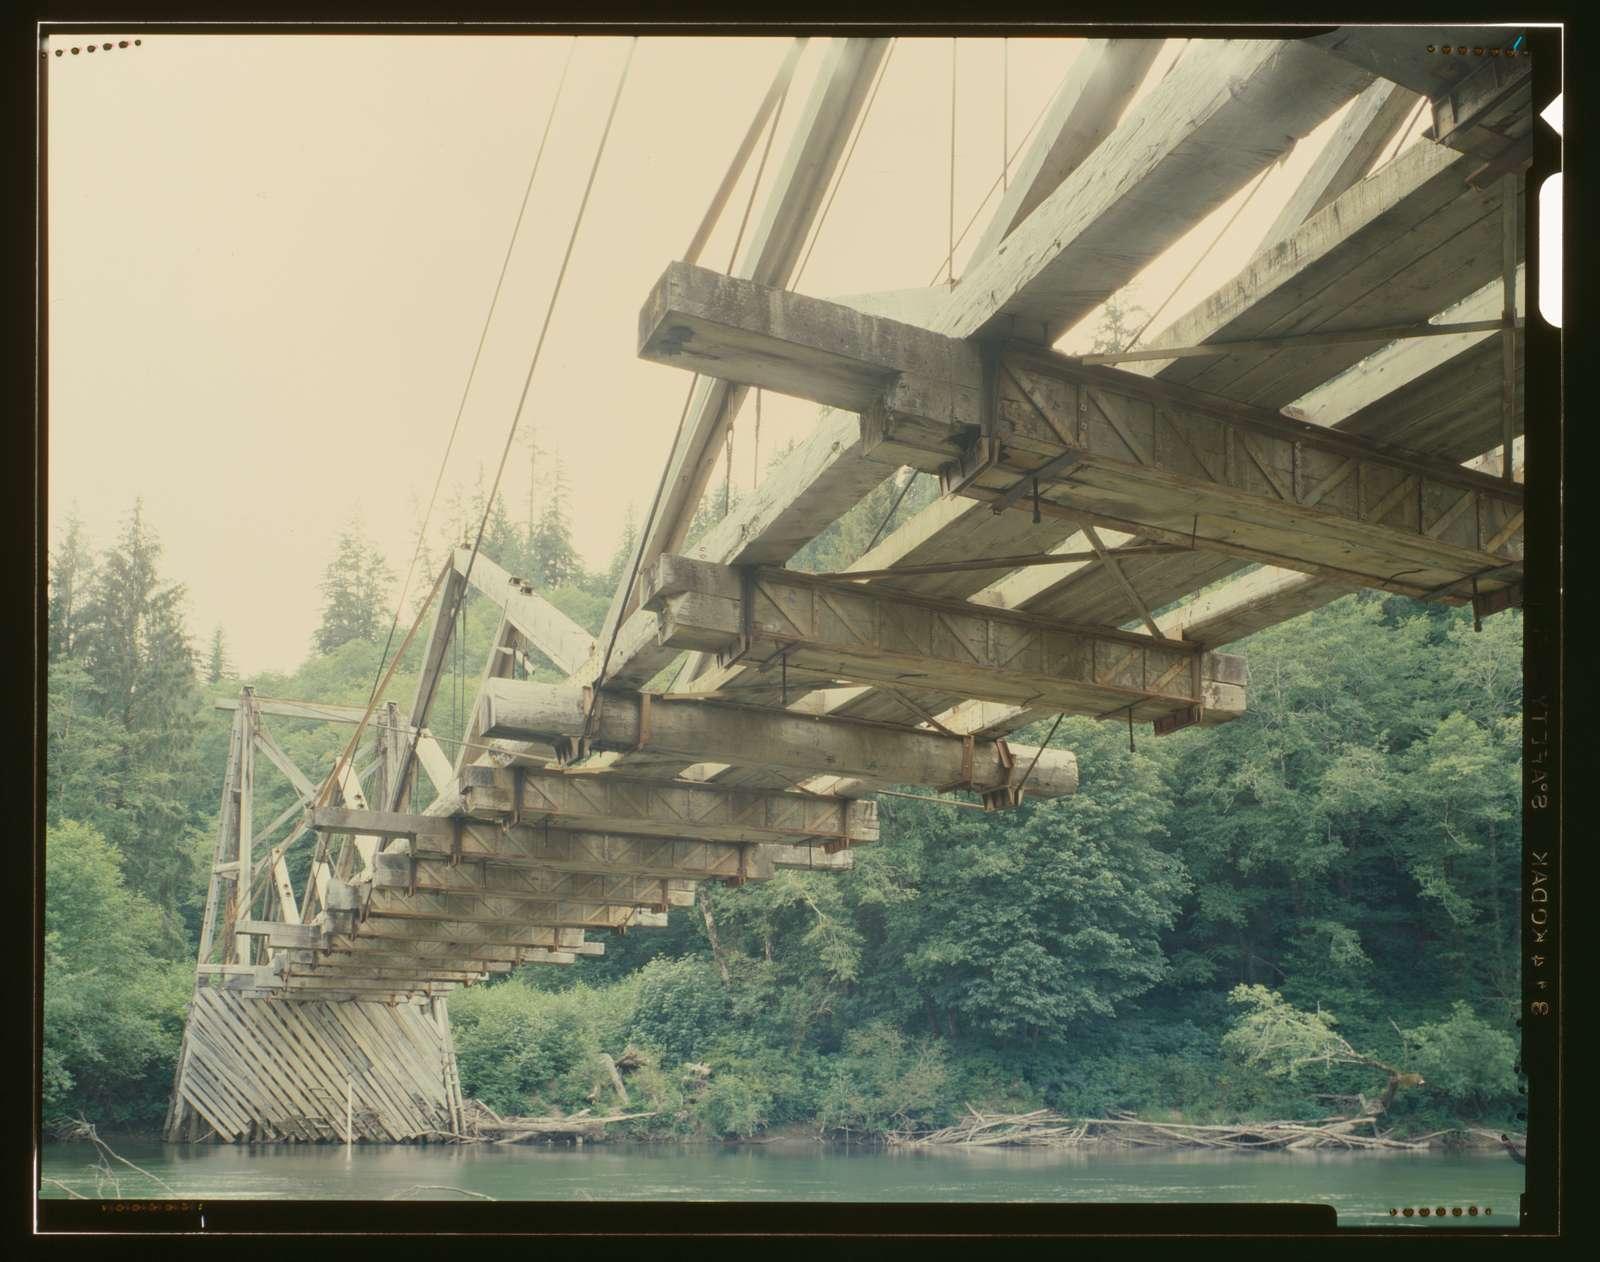 Chow Chow Suspension Bridge, Spanning Quinault River, Taholah, Grays Harbor County, WA